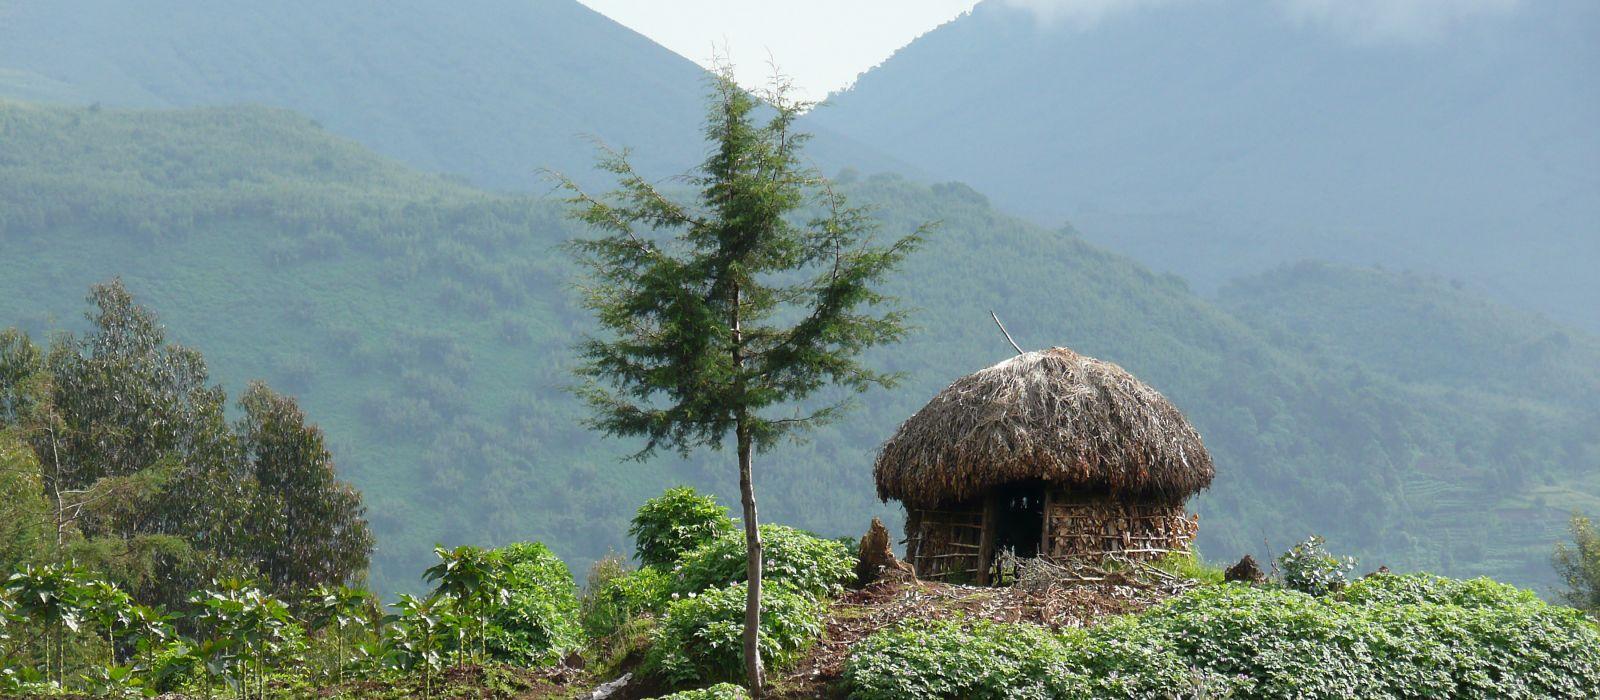 Small dwelling - Rwanda, Africa